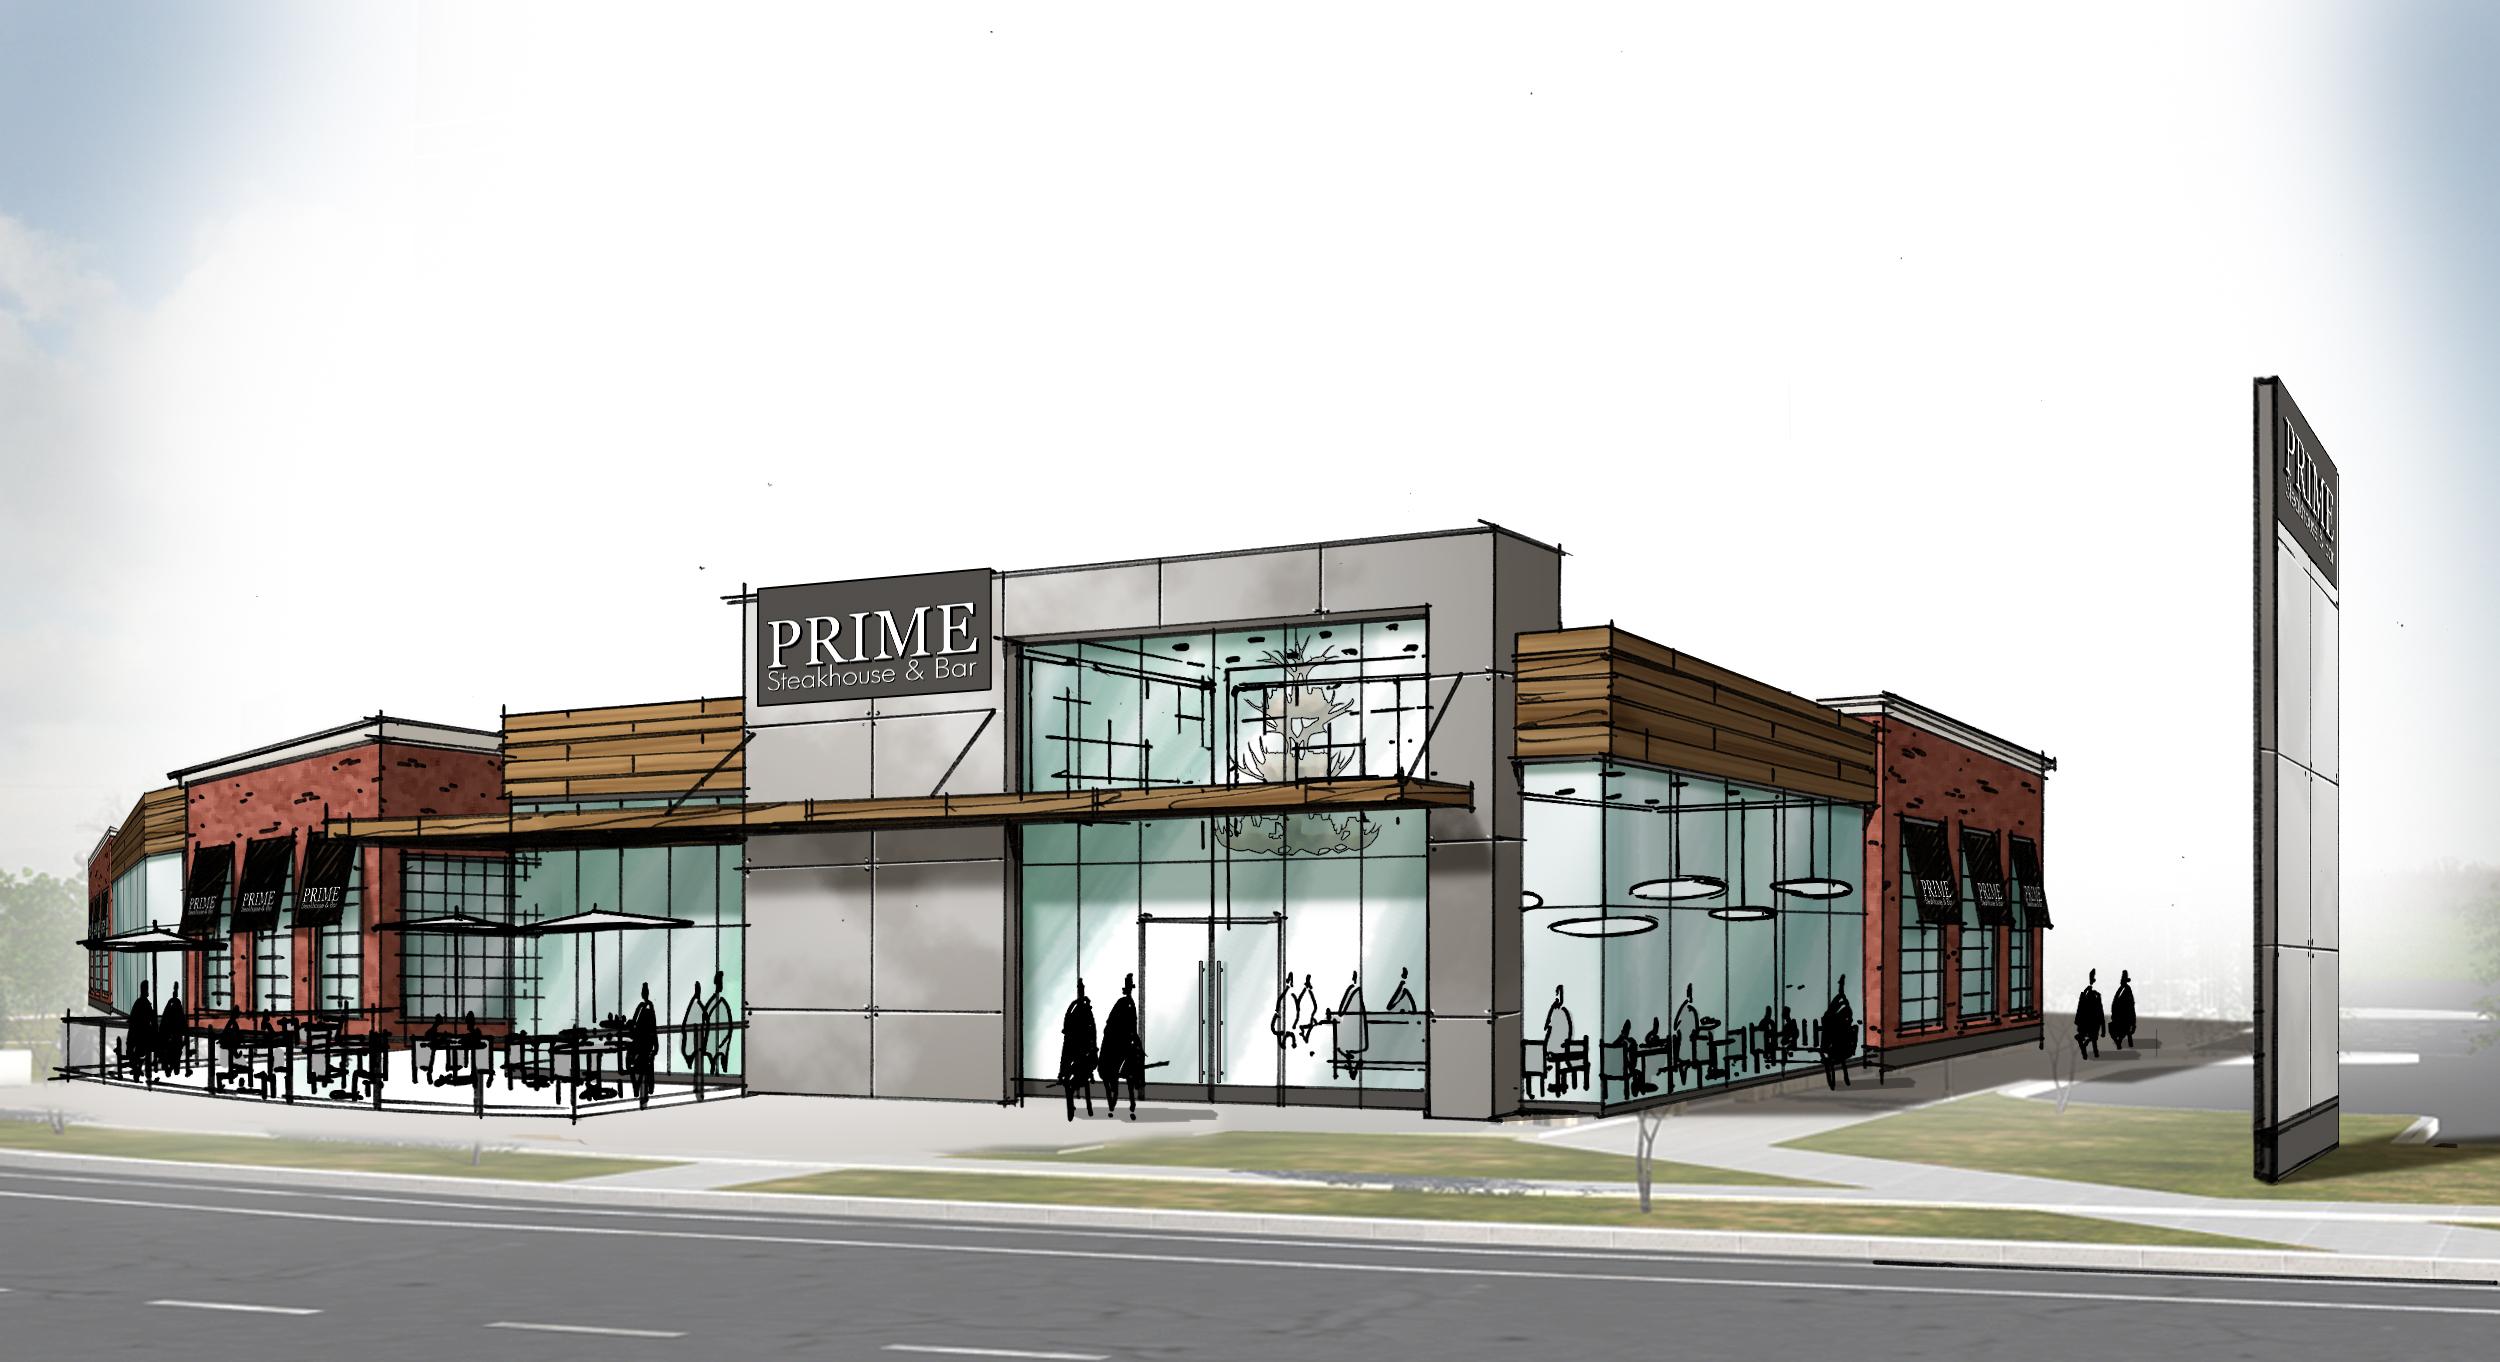 Restaurant exterior architecture - Campbellparksiderendering Jpg 550 219 Pixels Shopping Center Facades Pinterest Retail Architecture Facades And Architecture